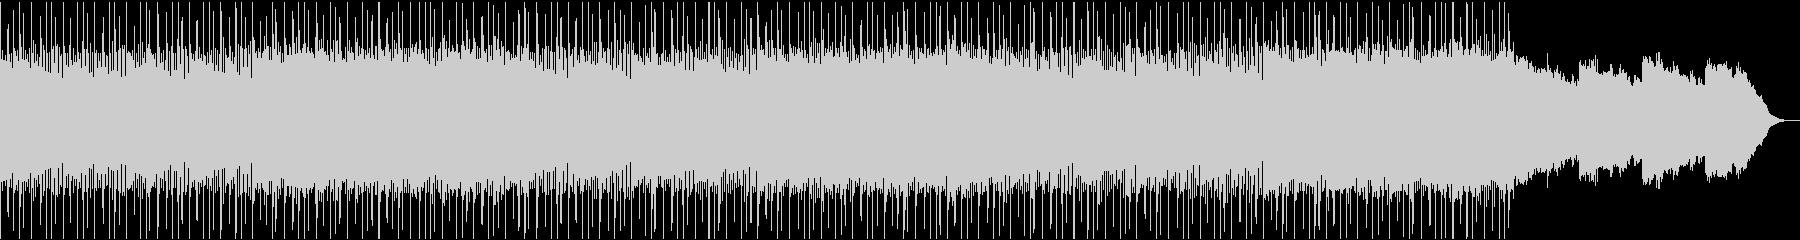 CHILLでLo-fiなビートです。の未再生の波形